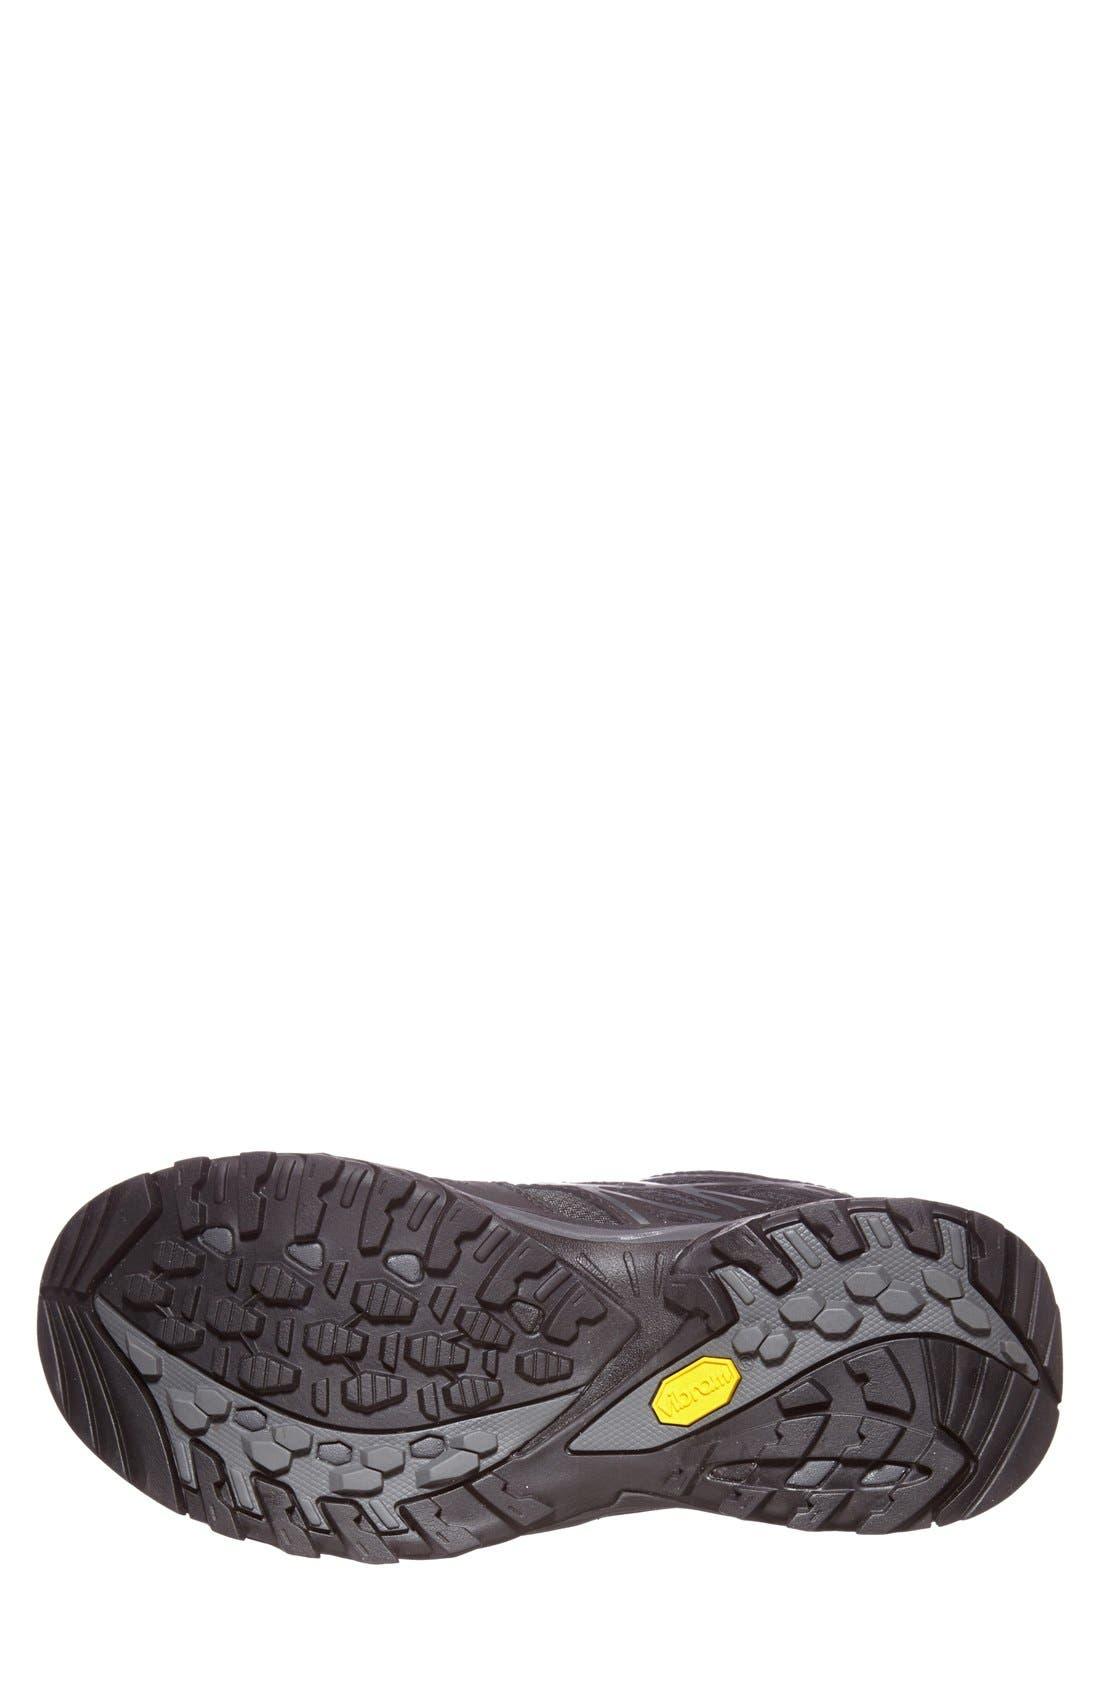 Alternate Image 4  - The North Face 'Hedgehog Fastpack' Gore-Tex® Waterproof Hiking Shoe (Men)